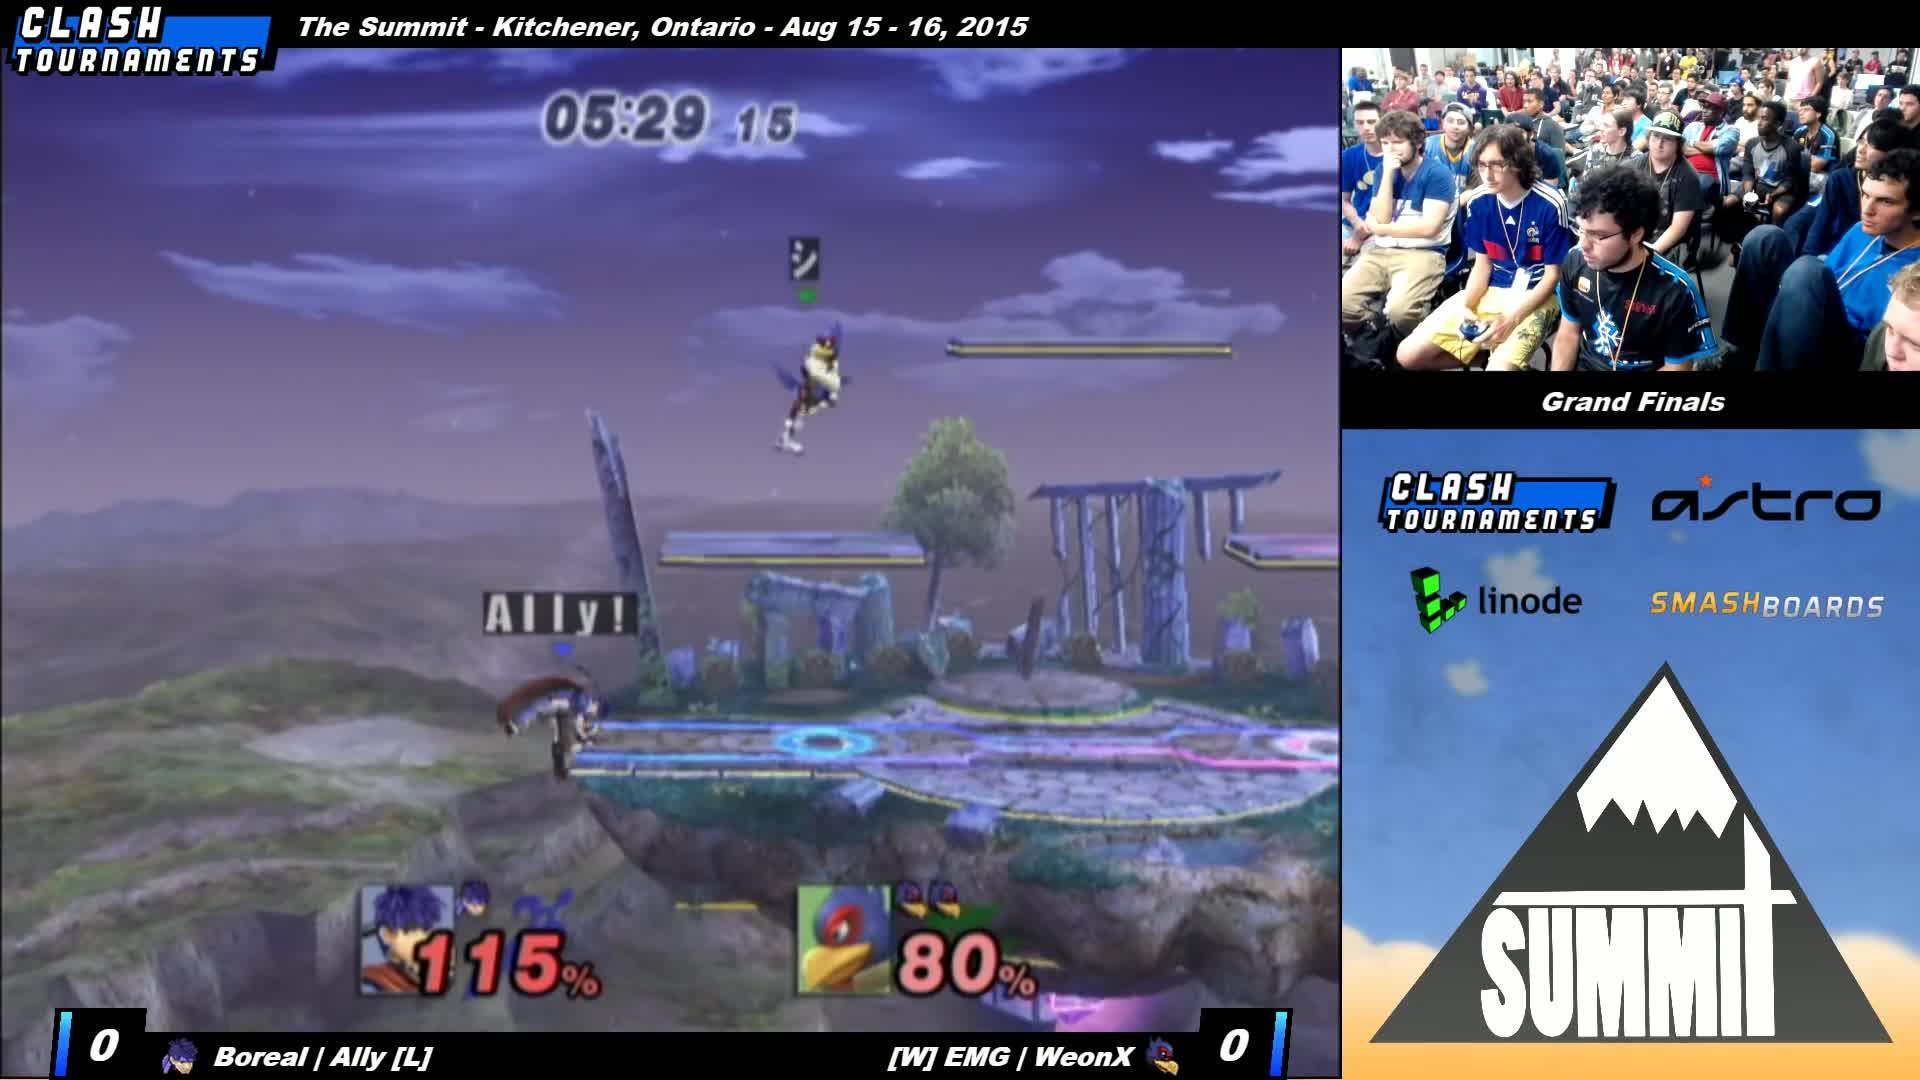 brawl, mod, pm, smash 4, smashgifs, smashtournament, ssmb, super smash bros. brawl, super smash bros. for nintendo 3ds and wii u (video game), super smash bros. for wii u, super smash bros. melee, tournament, Wall Jump - Summit - Ally (Ike) vs Weon-X (Falco) - Grand Finals - Project M GIFs